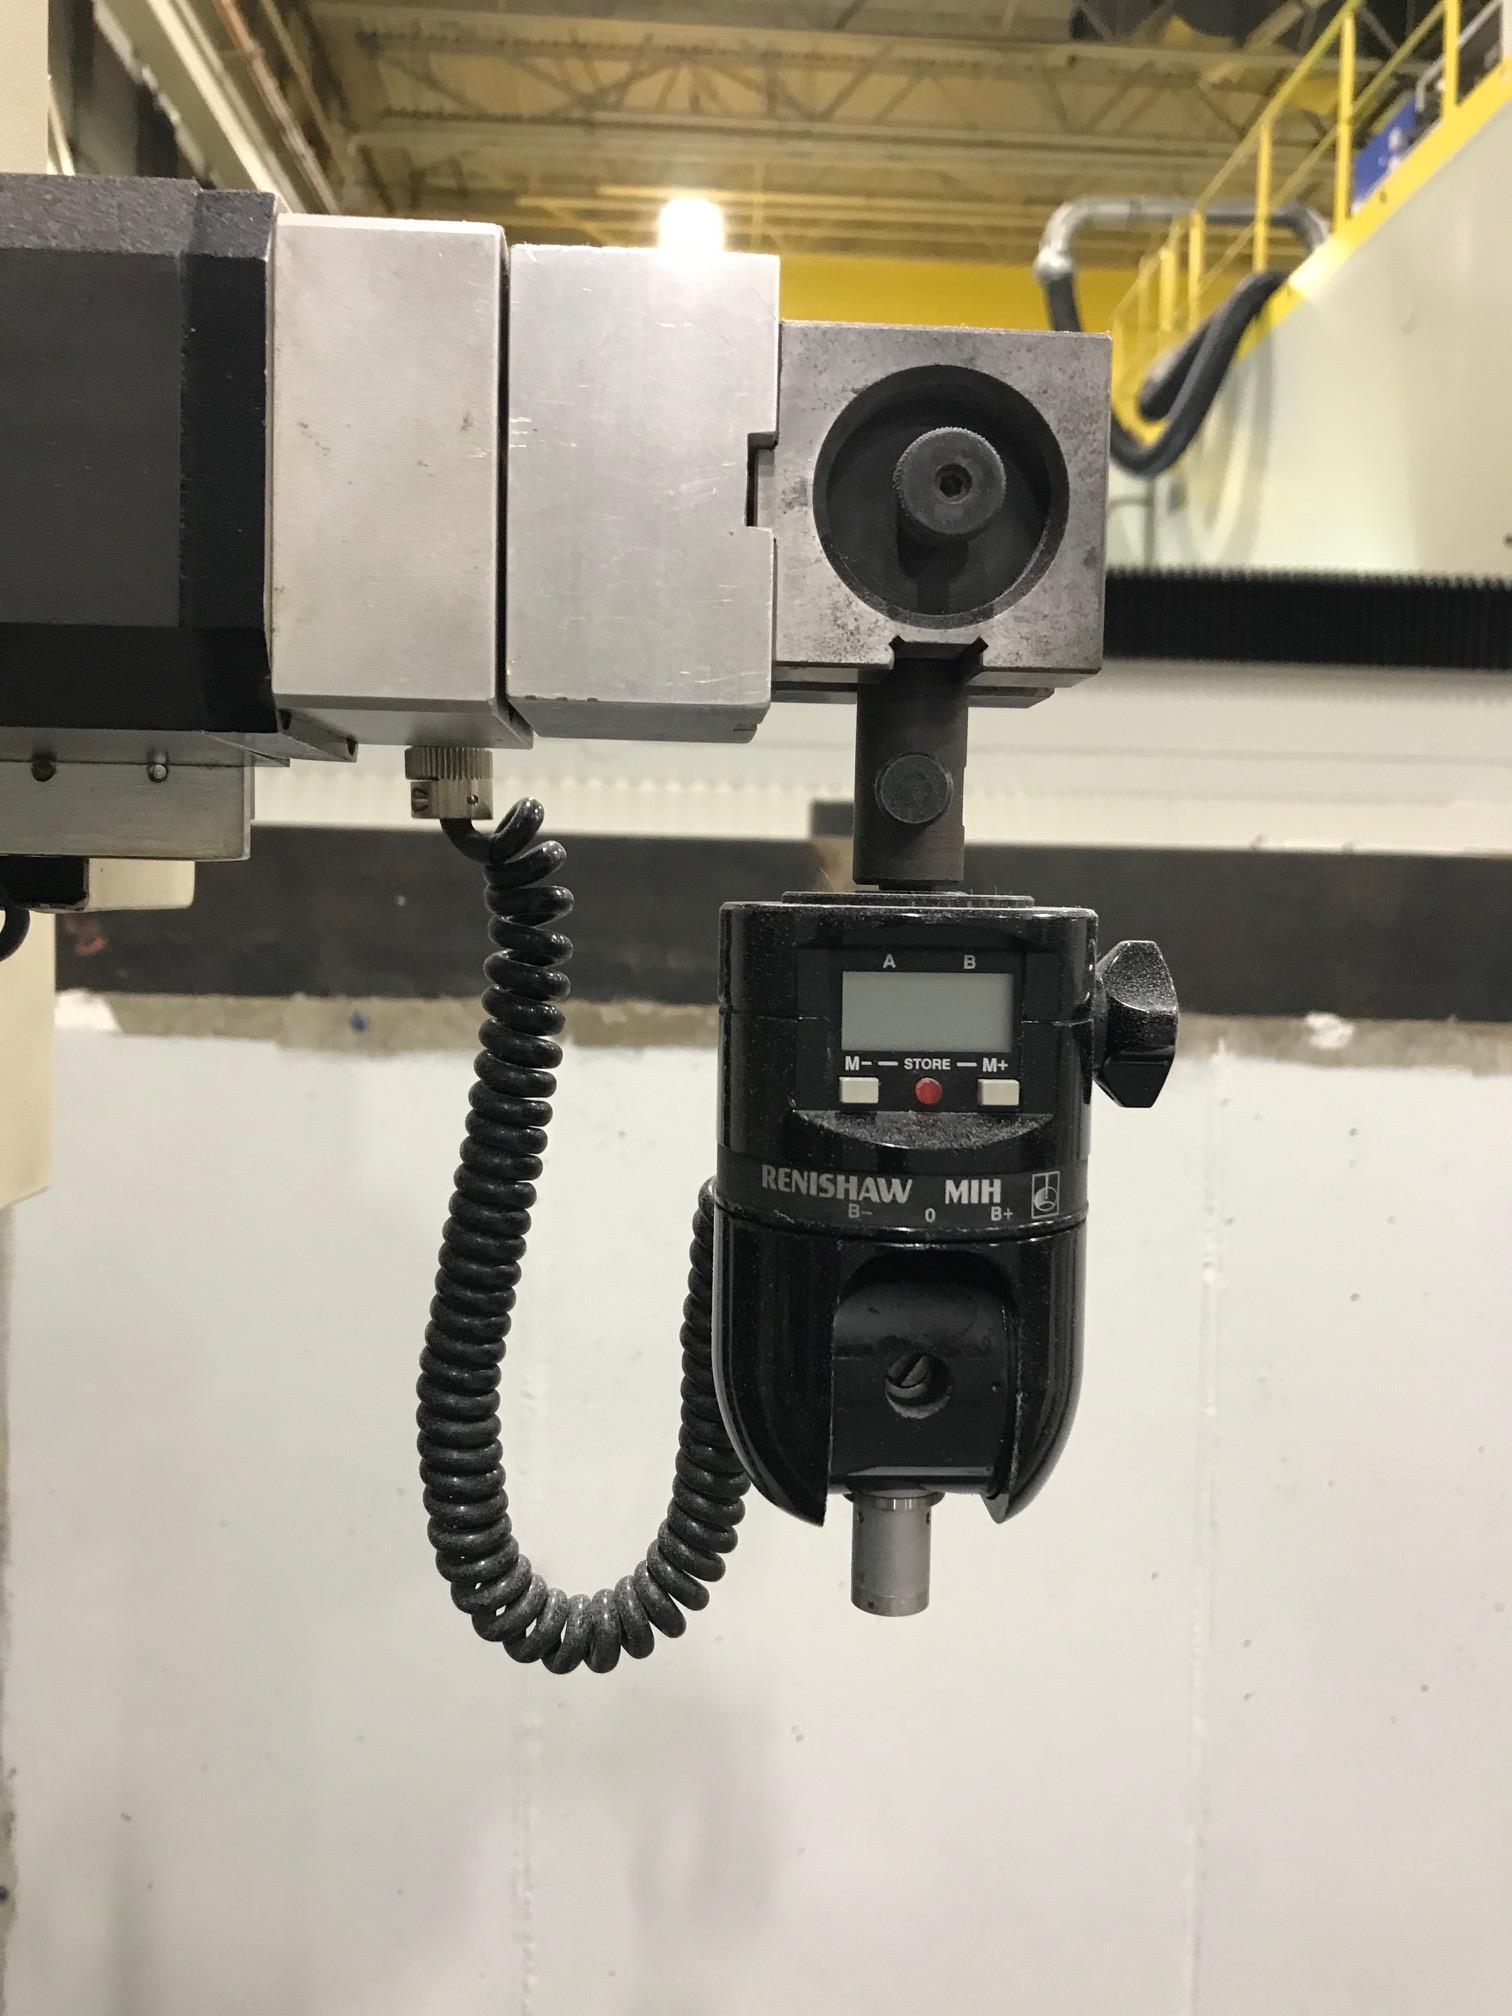 USED POLI GLOBO COORDINATE MANUAL MEASURING MACHINE, Stock No. 10616